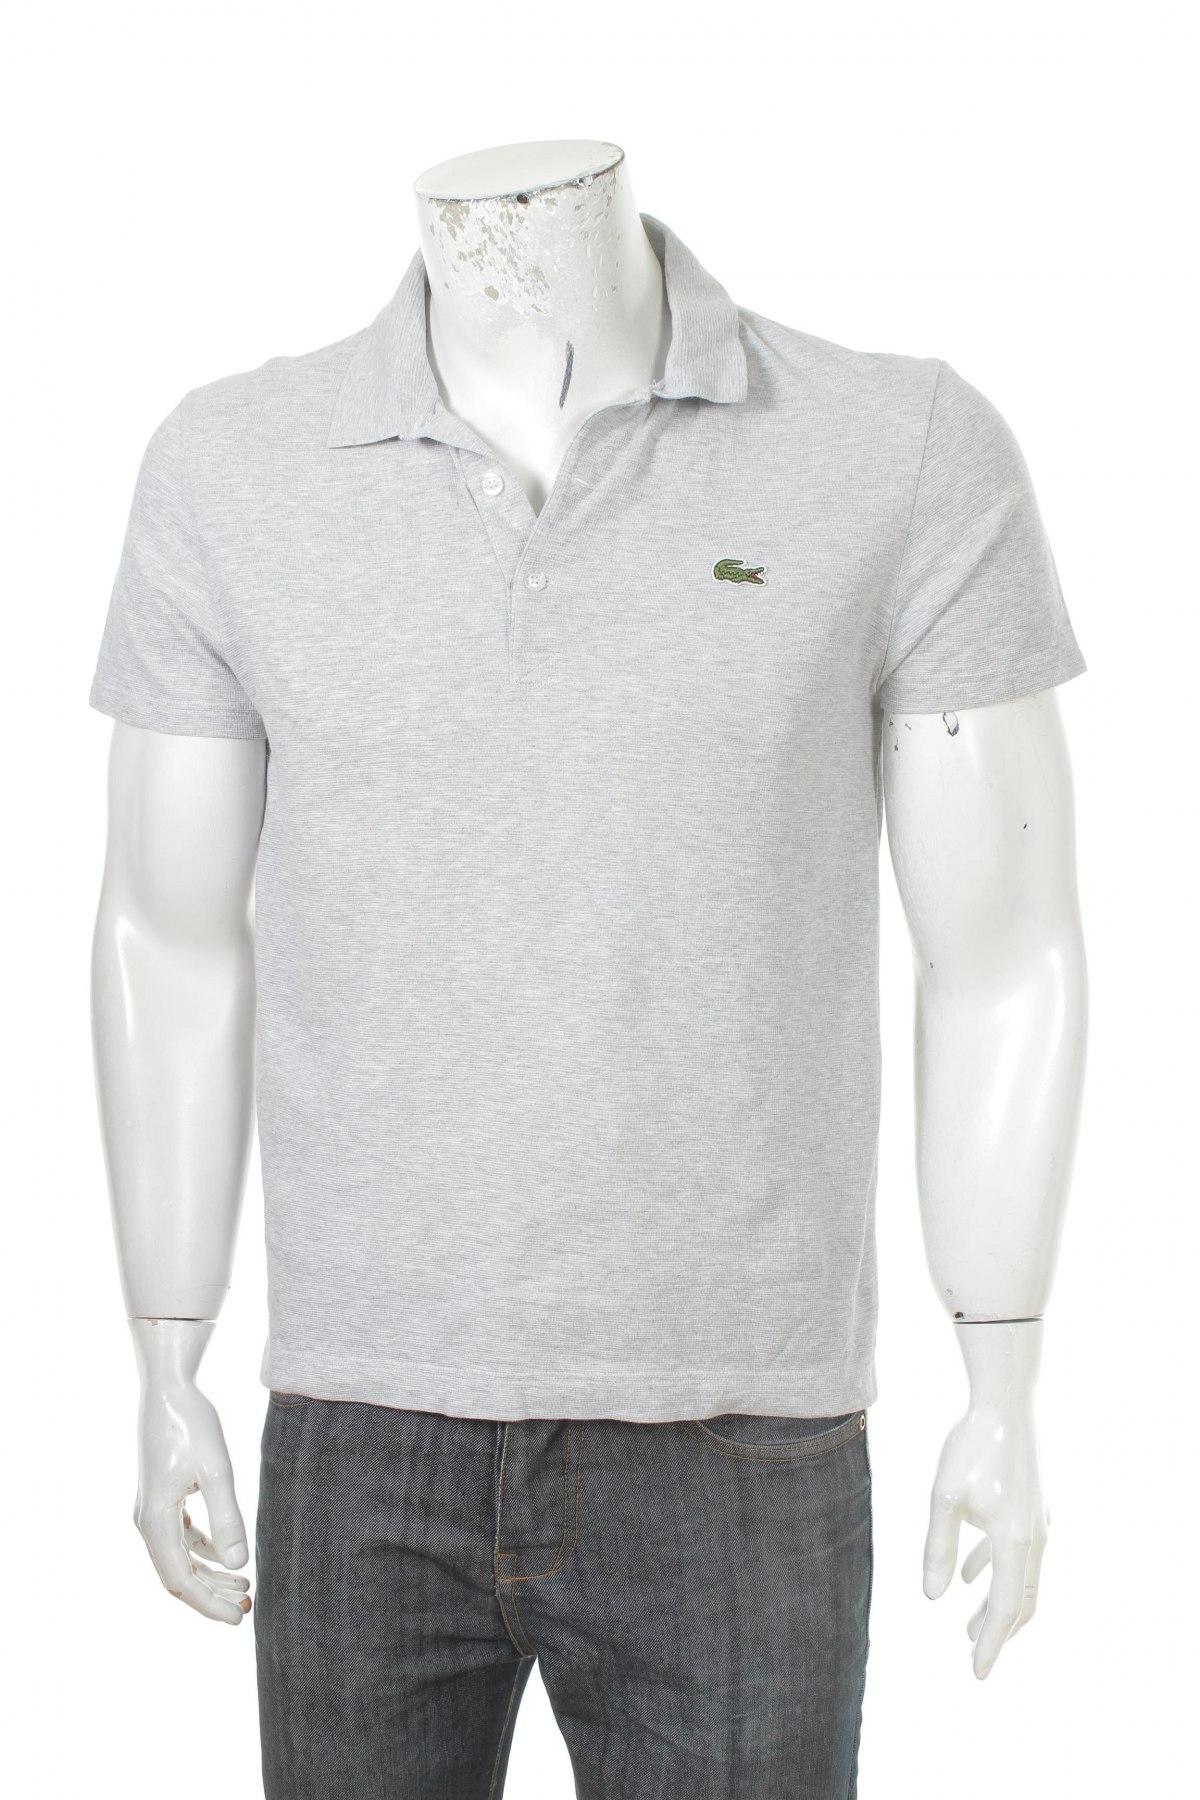 7796544e44f5 Ανδρικό t-shirt Lacoste - σε συμφέρουσα τιμή στο Remix -  100233988